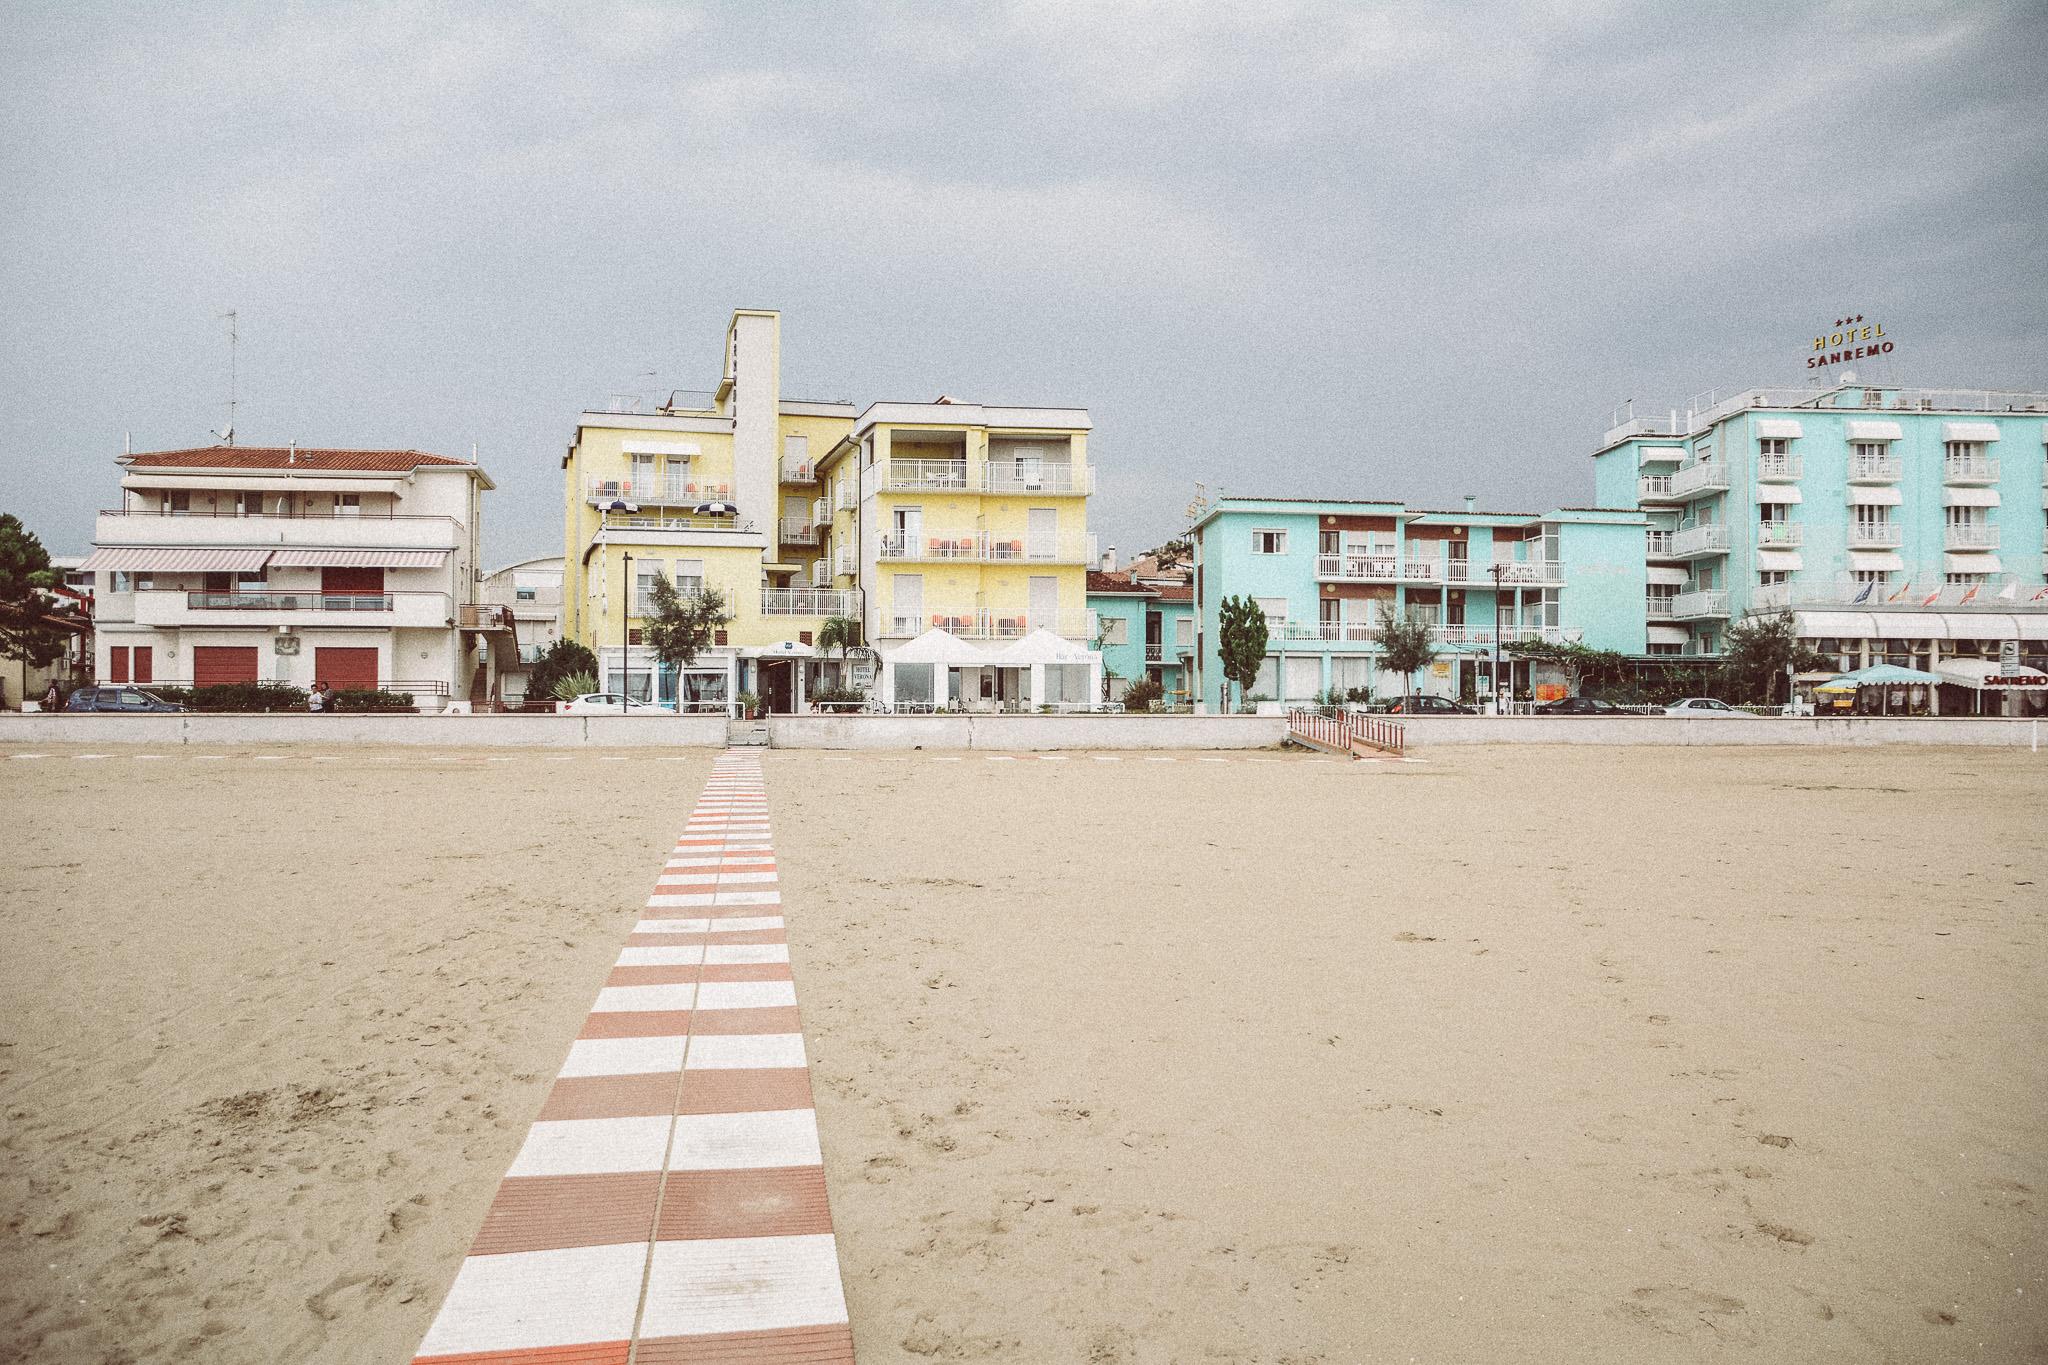 09-20-Caorle-beach-41_LR edited_FB.jpg